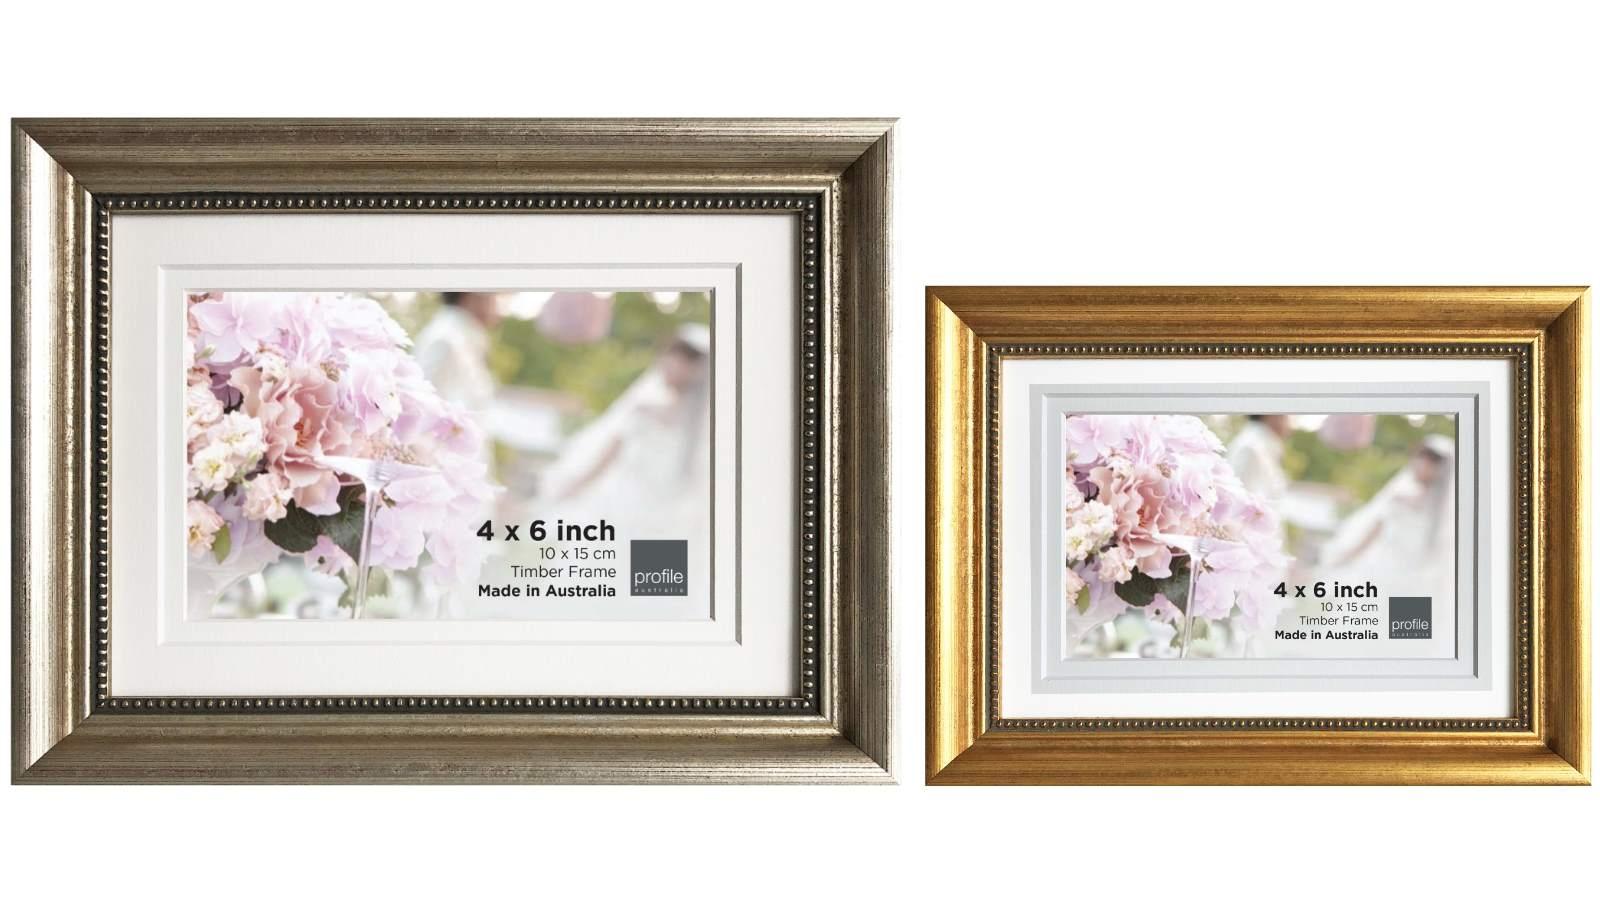 Image of Platinum Majestic 28x35cm/20x25cm Photo Frame